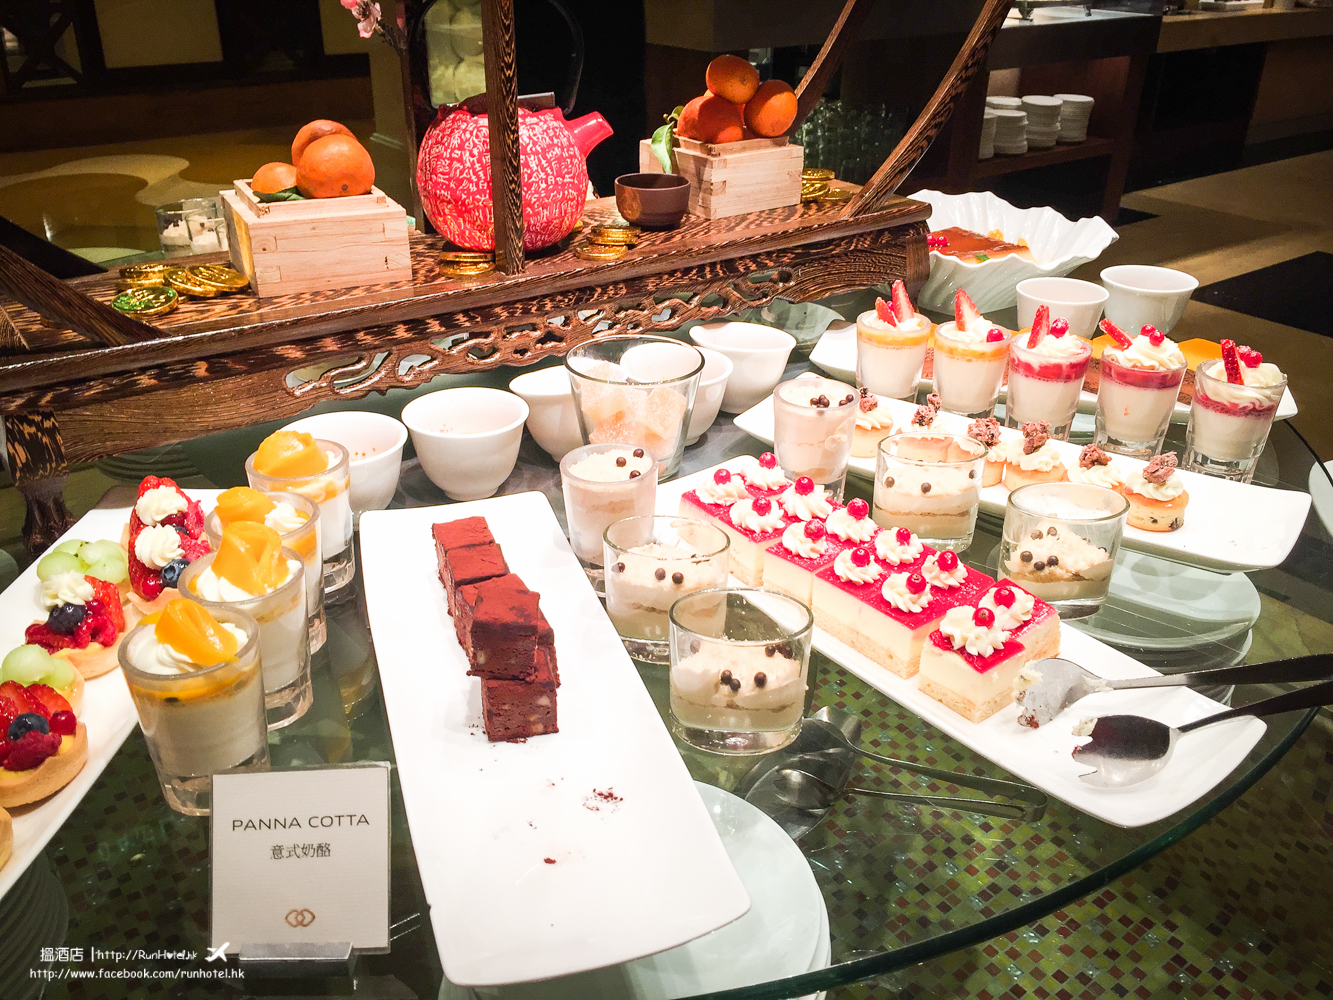 sofitel buffet Macau (42)